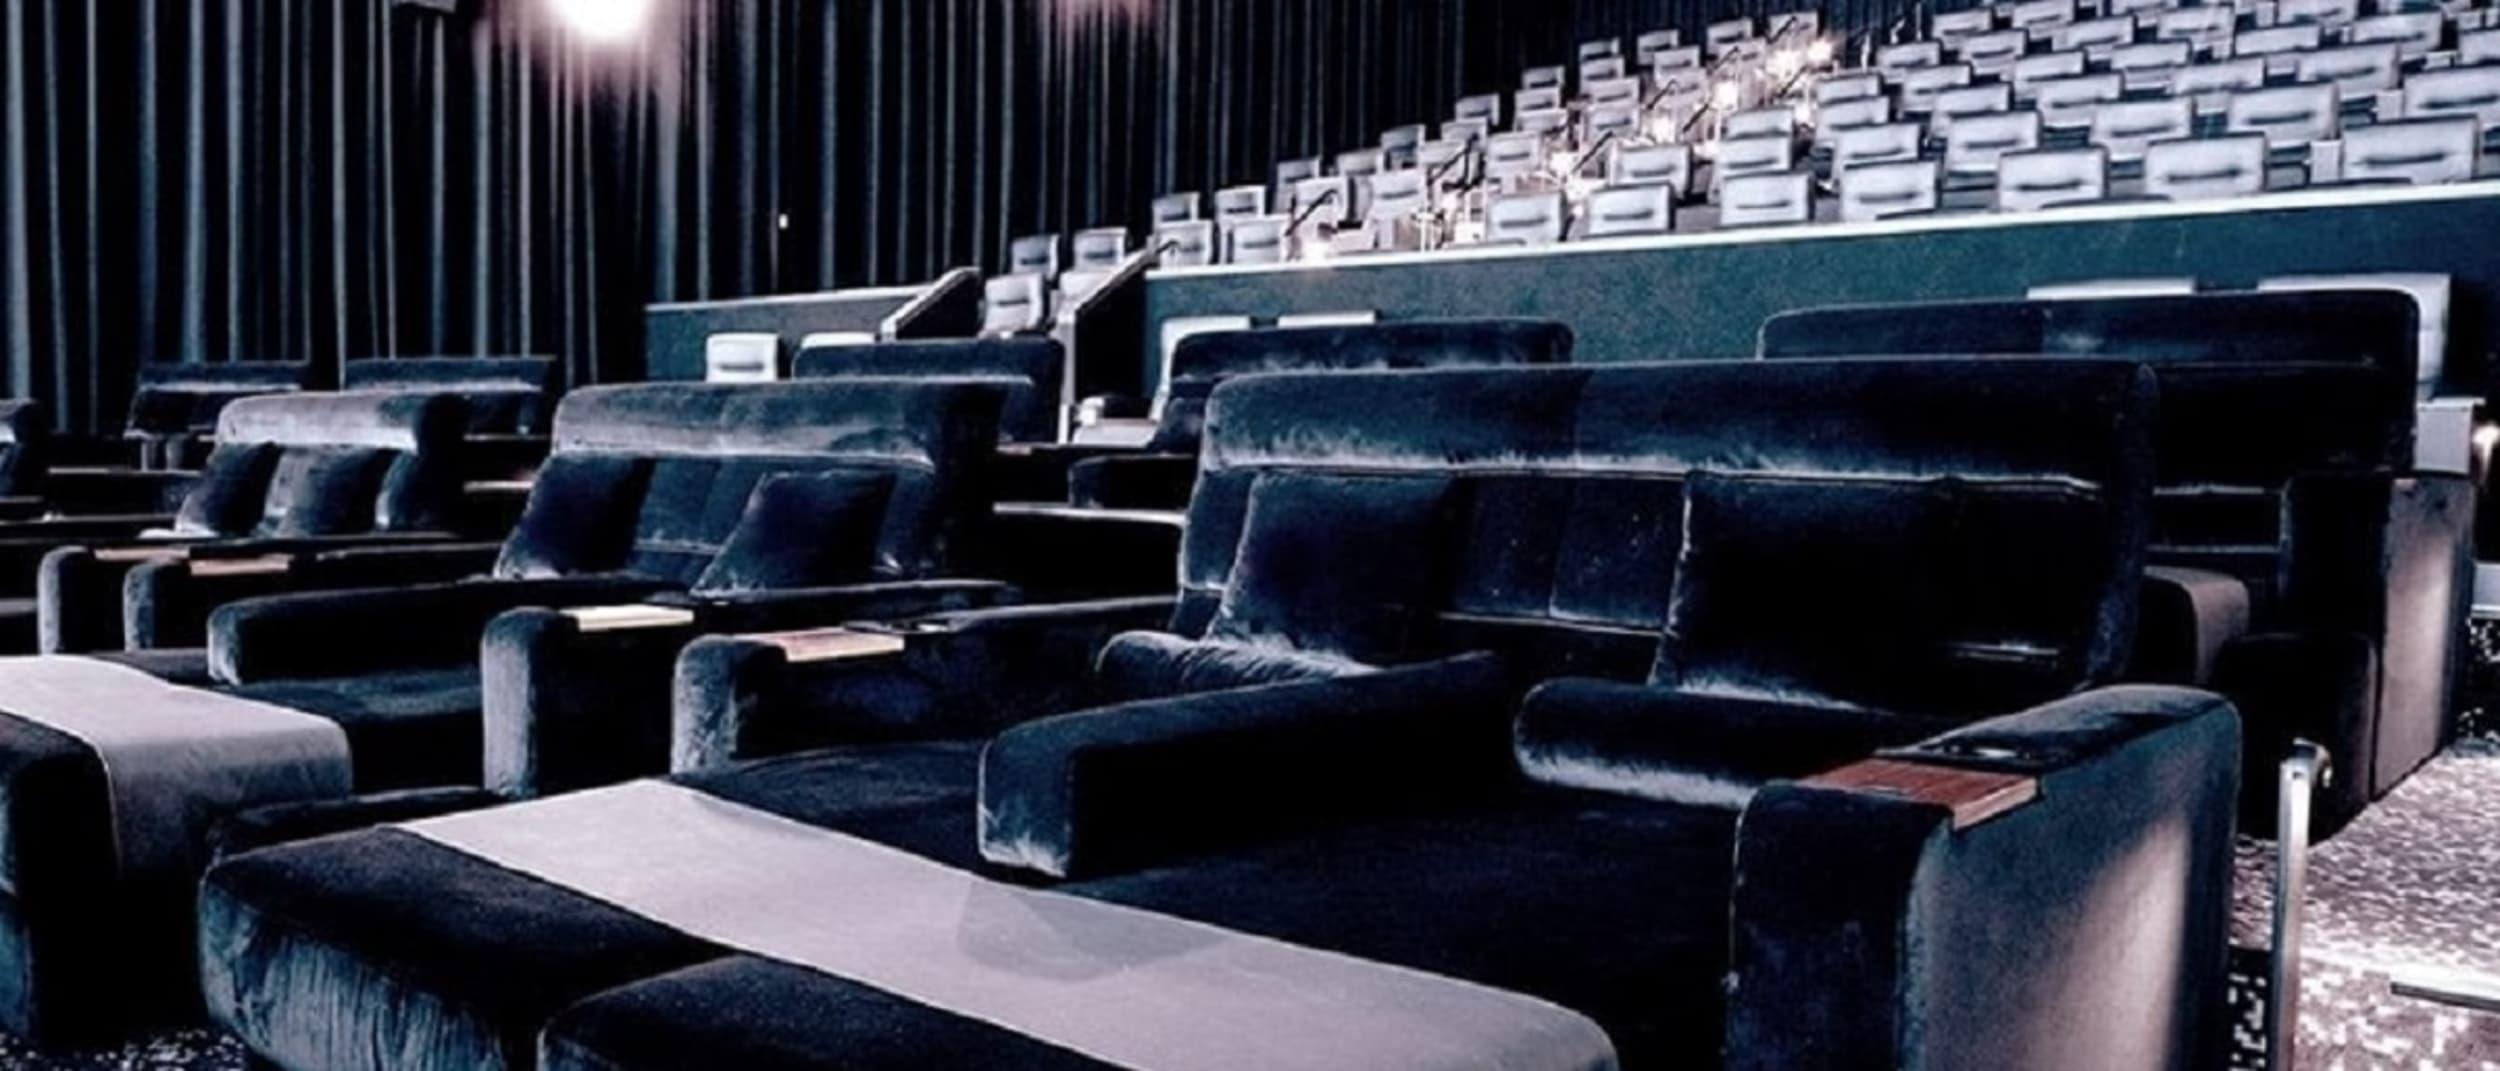 Event Cinemas: Lounging in Luxury